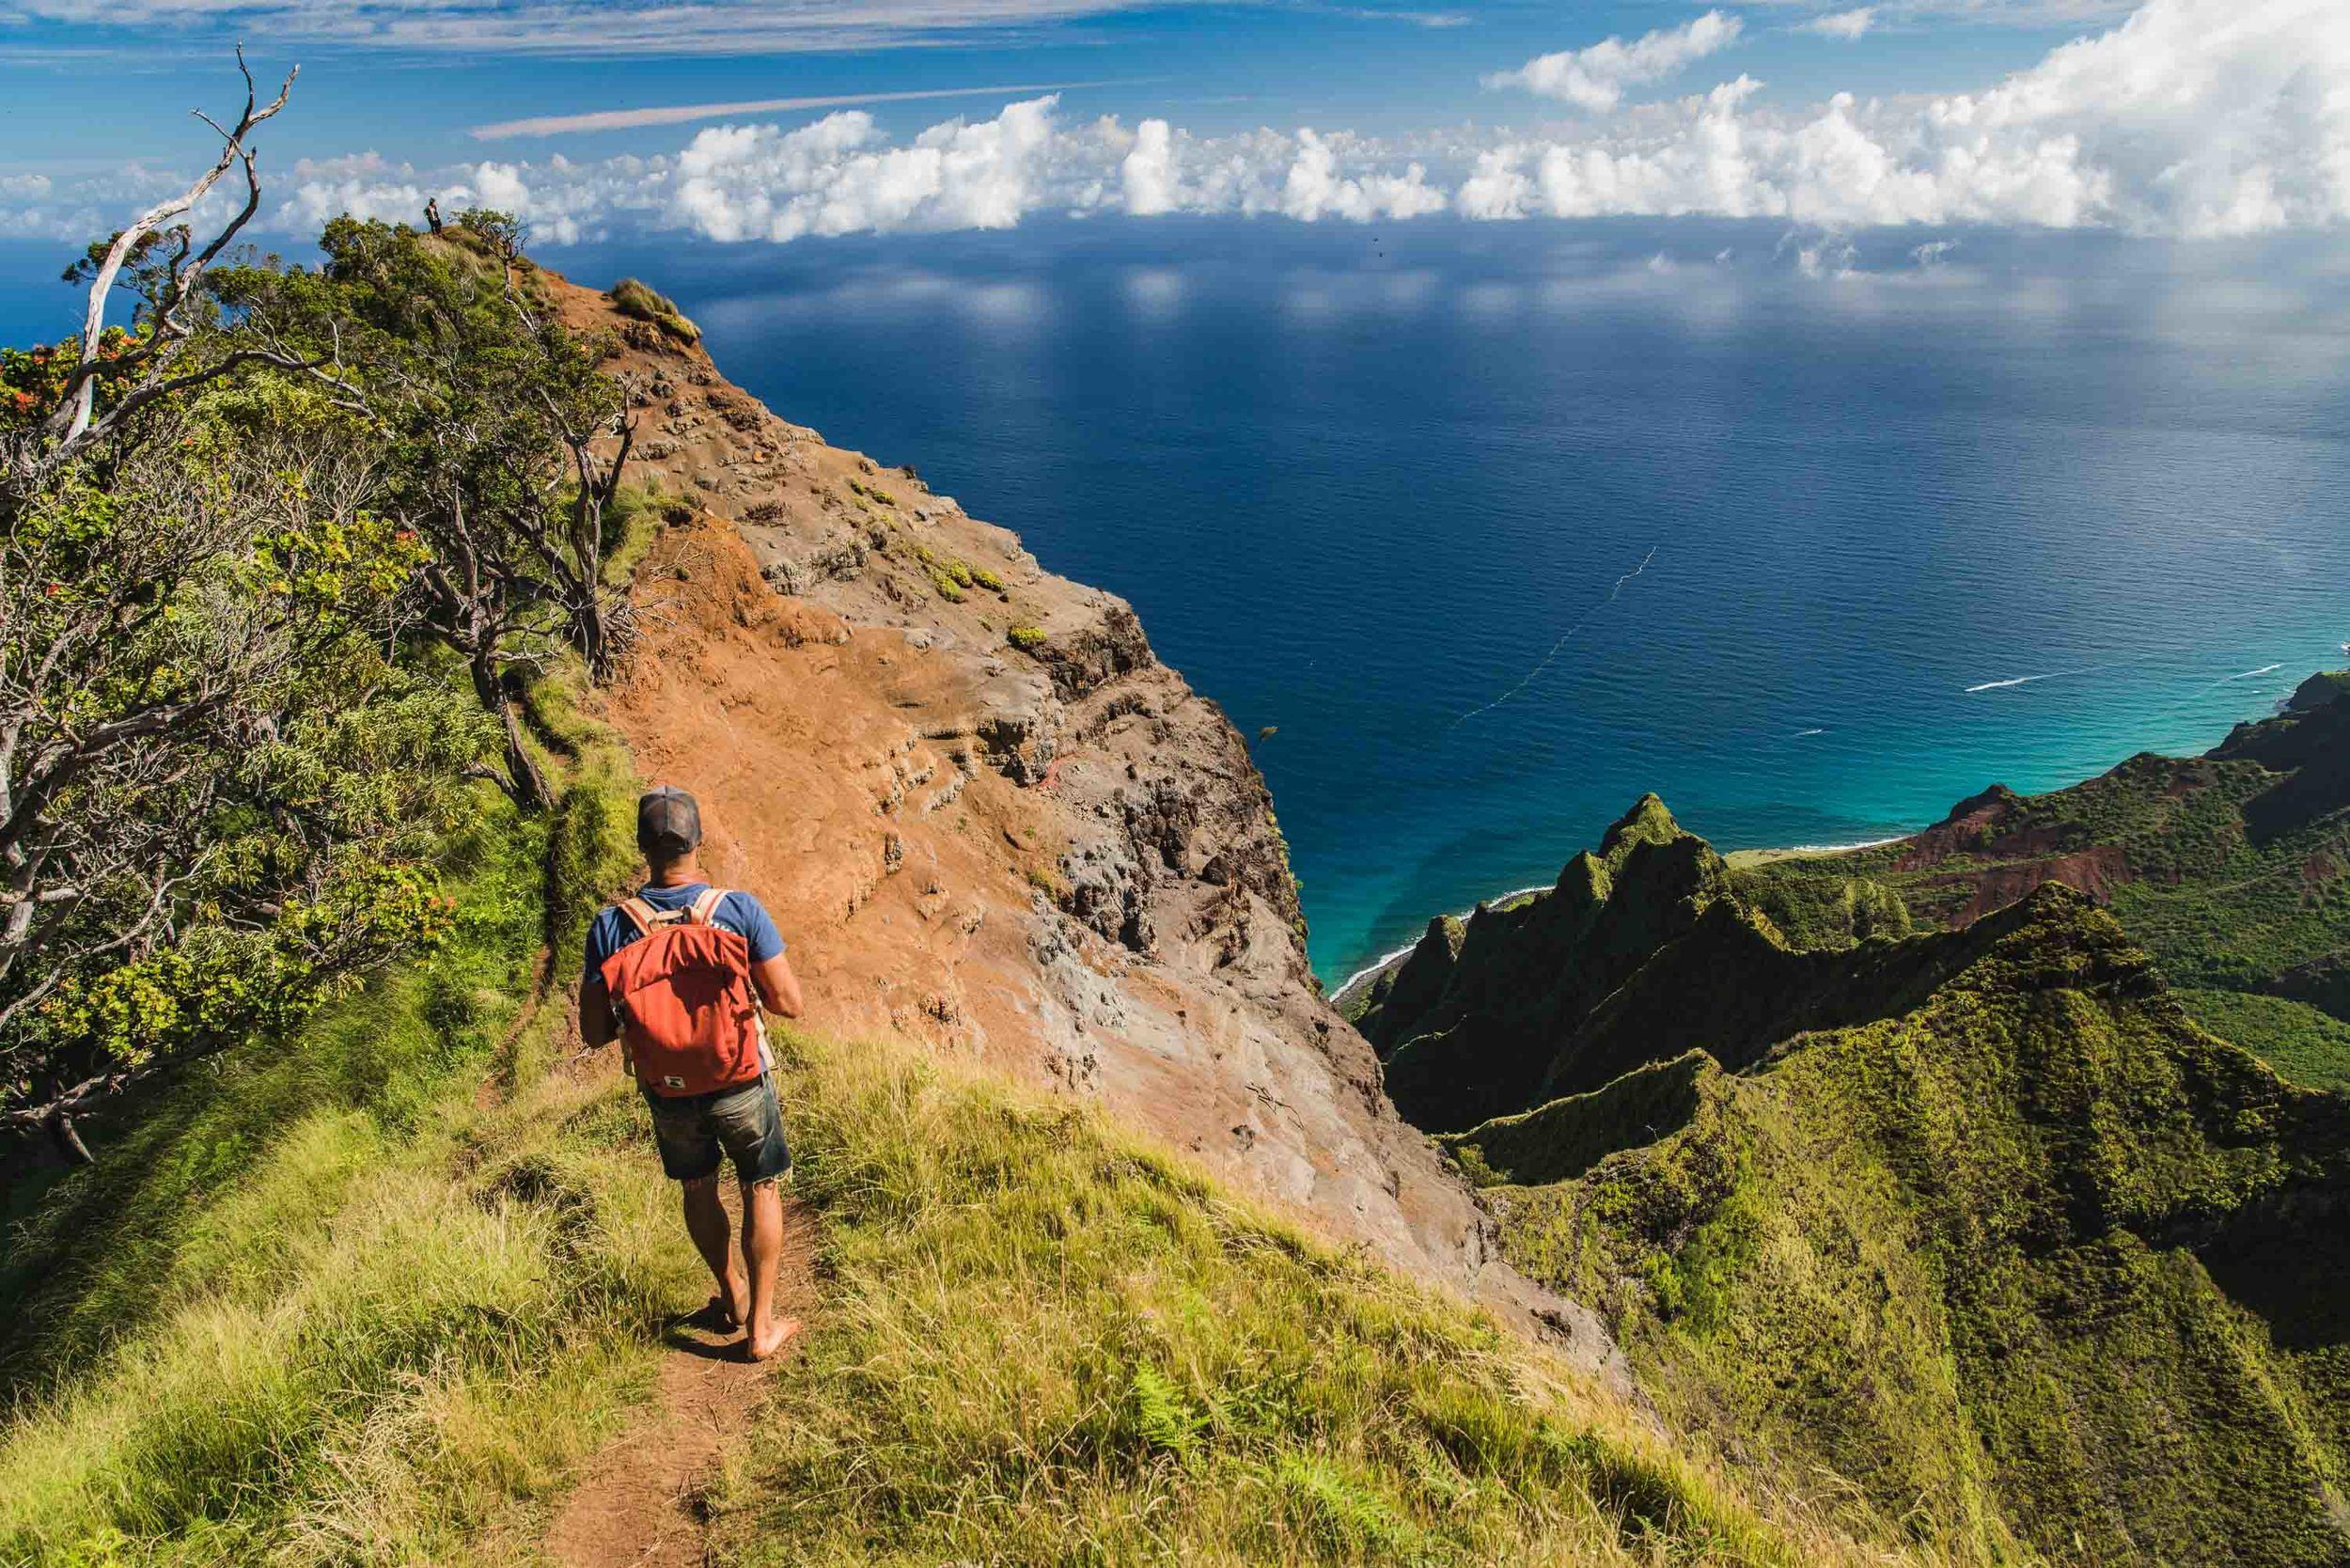 bryce-johnson-kalalau-ridge-kauai-hiking-hammock-palmwood-aloha-exchange-5.jpg